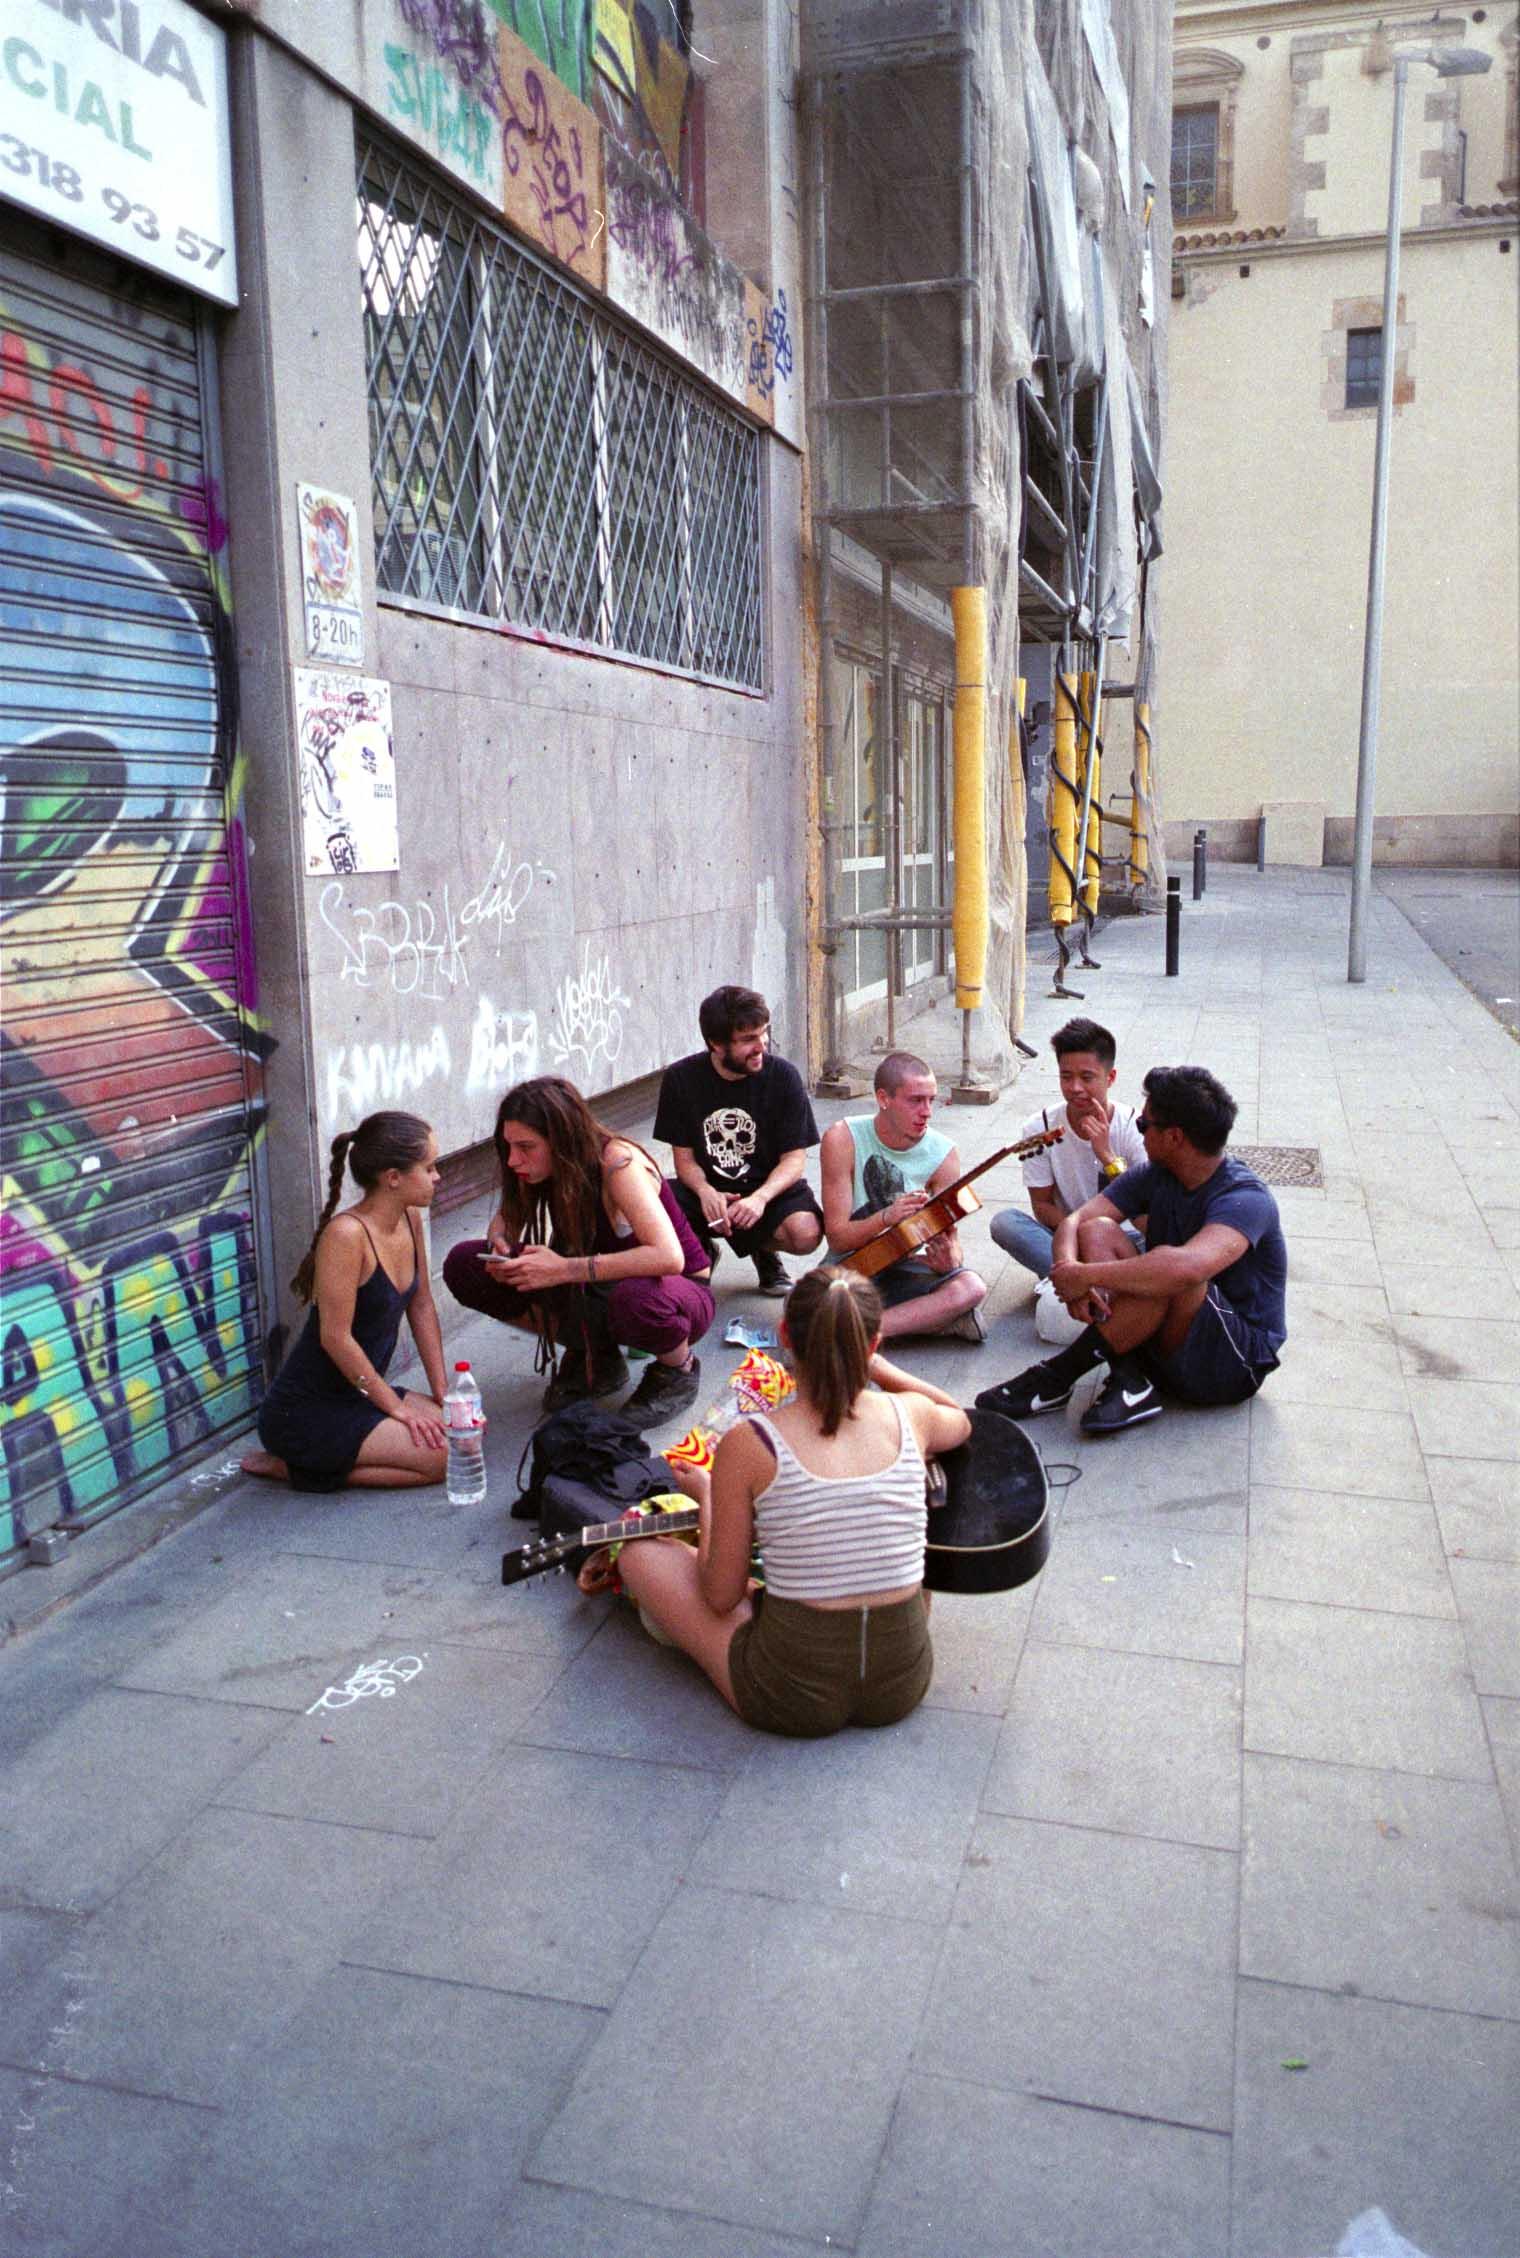 Barcelona, pandilla, Plaza castilla, guitarra